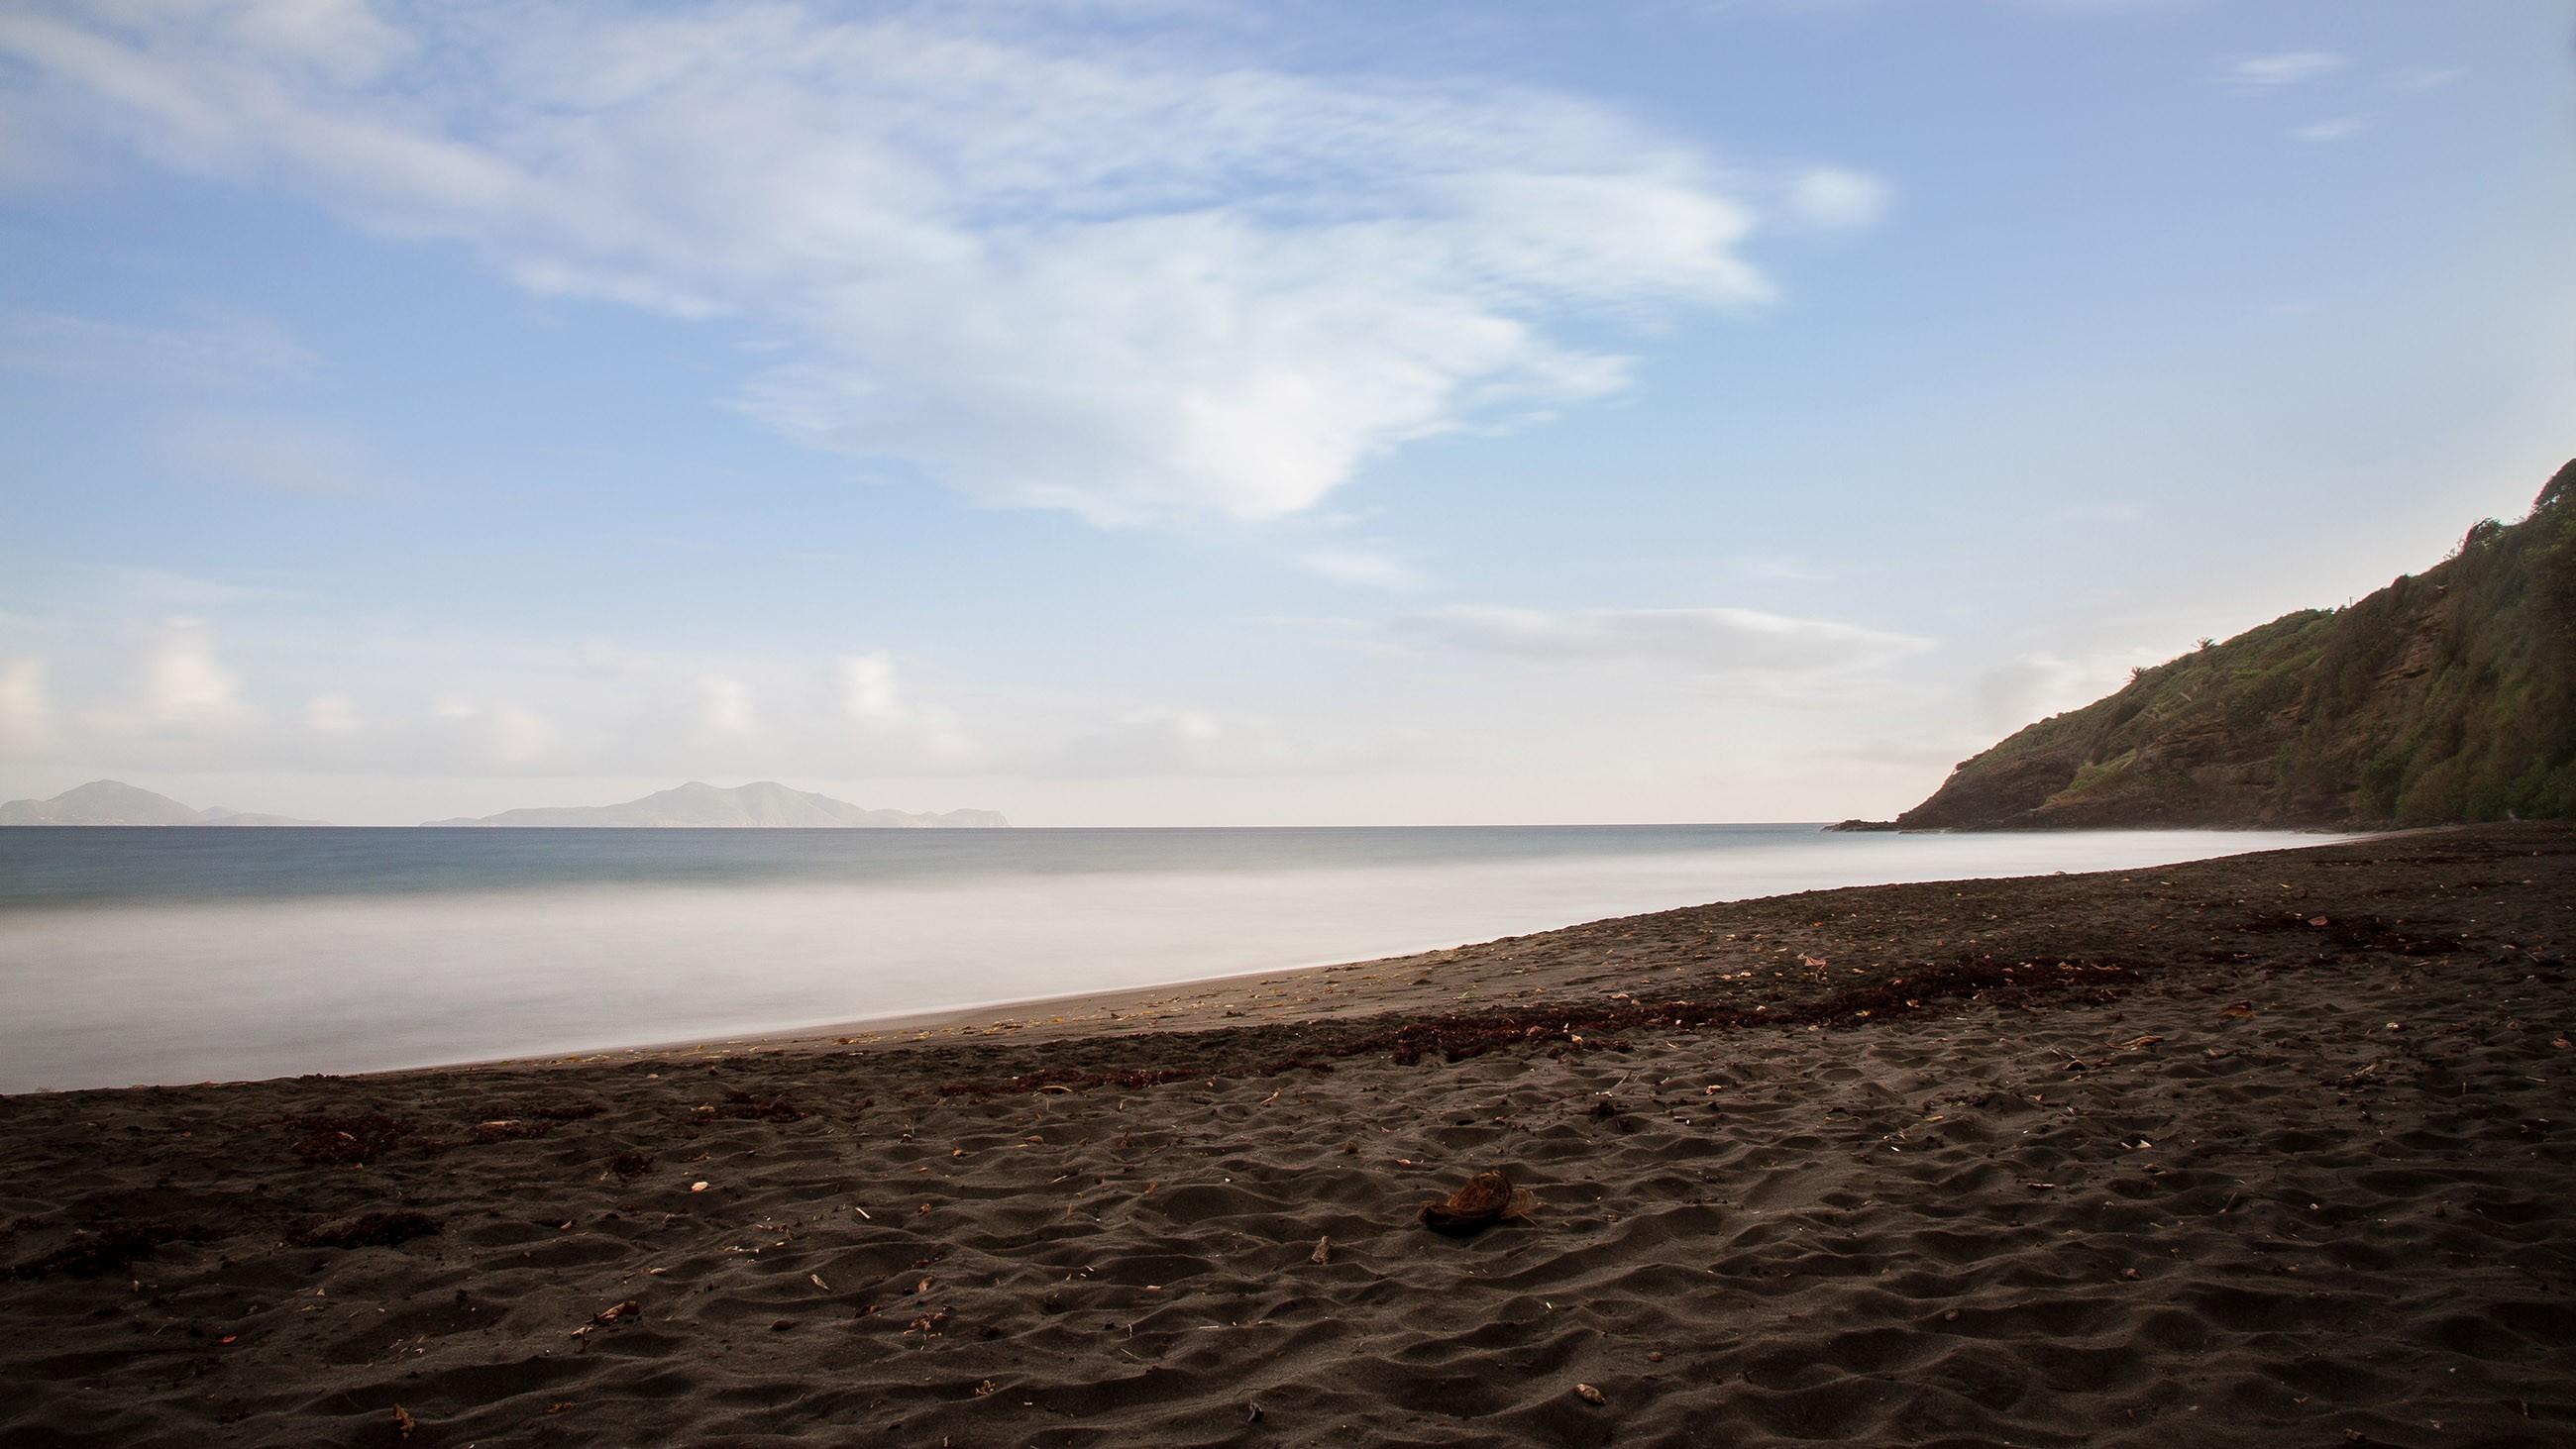 beach-sunset-troisrivieres-guadeloupe-france-paradise-island-caribbean-nobody